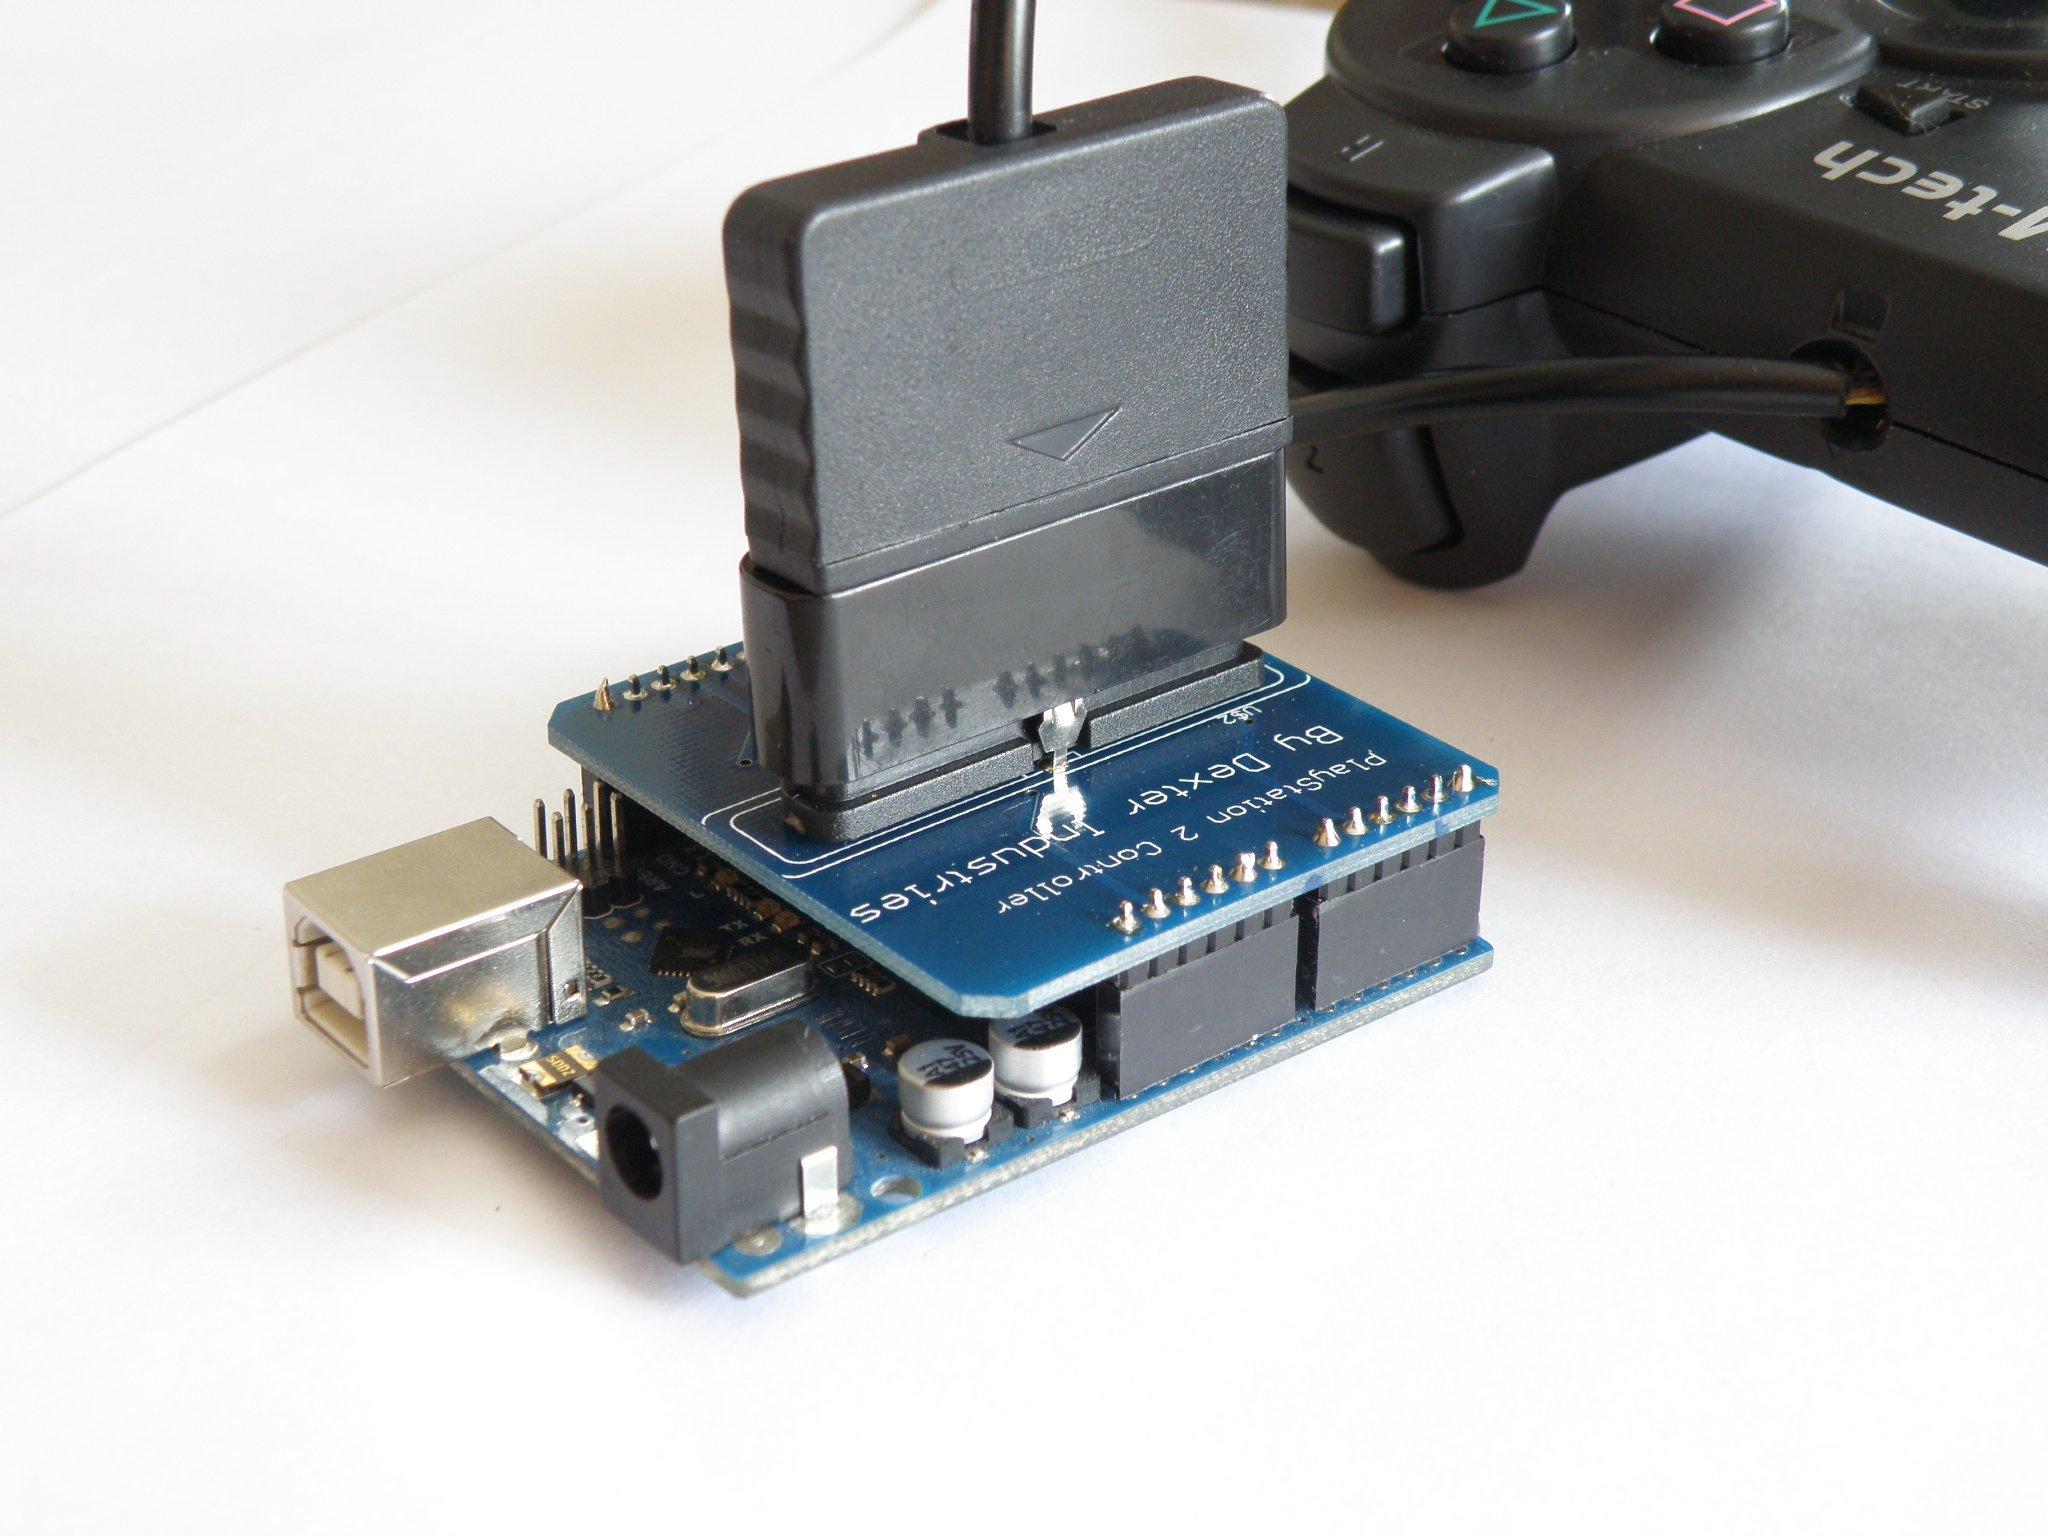 Arduino playstation dualshock shield from dexterindustries